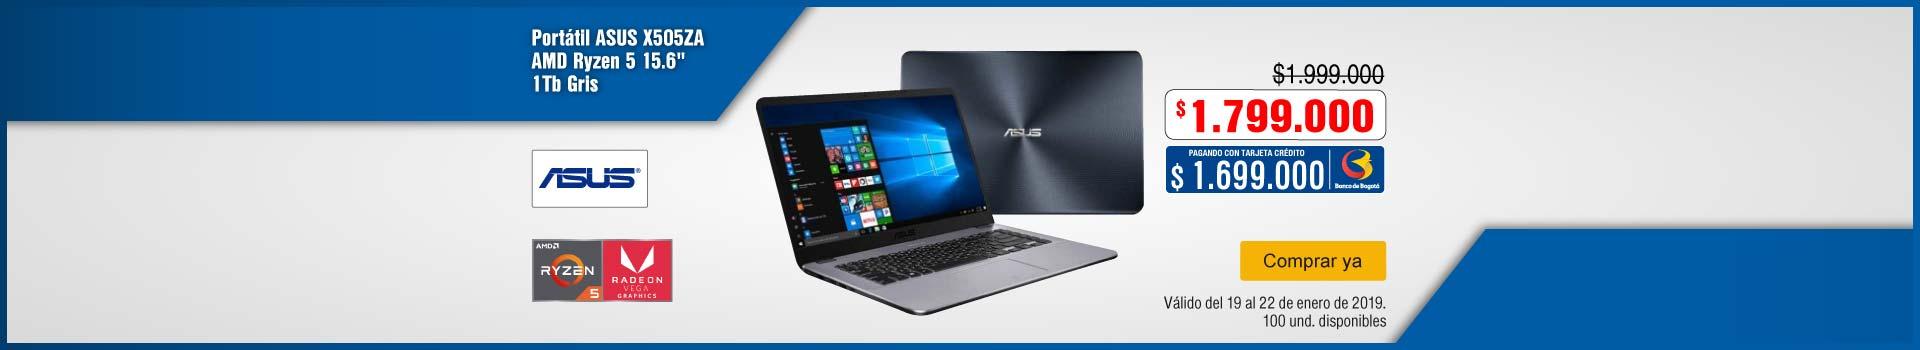 AK-KT-BCAT-3-computadores y tablets-PP---Asus-Portátil X505ZA-ene19